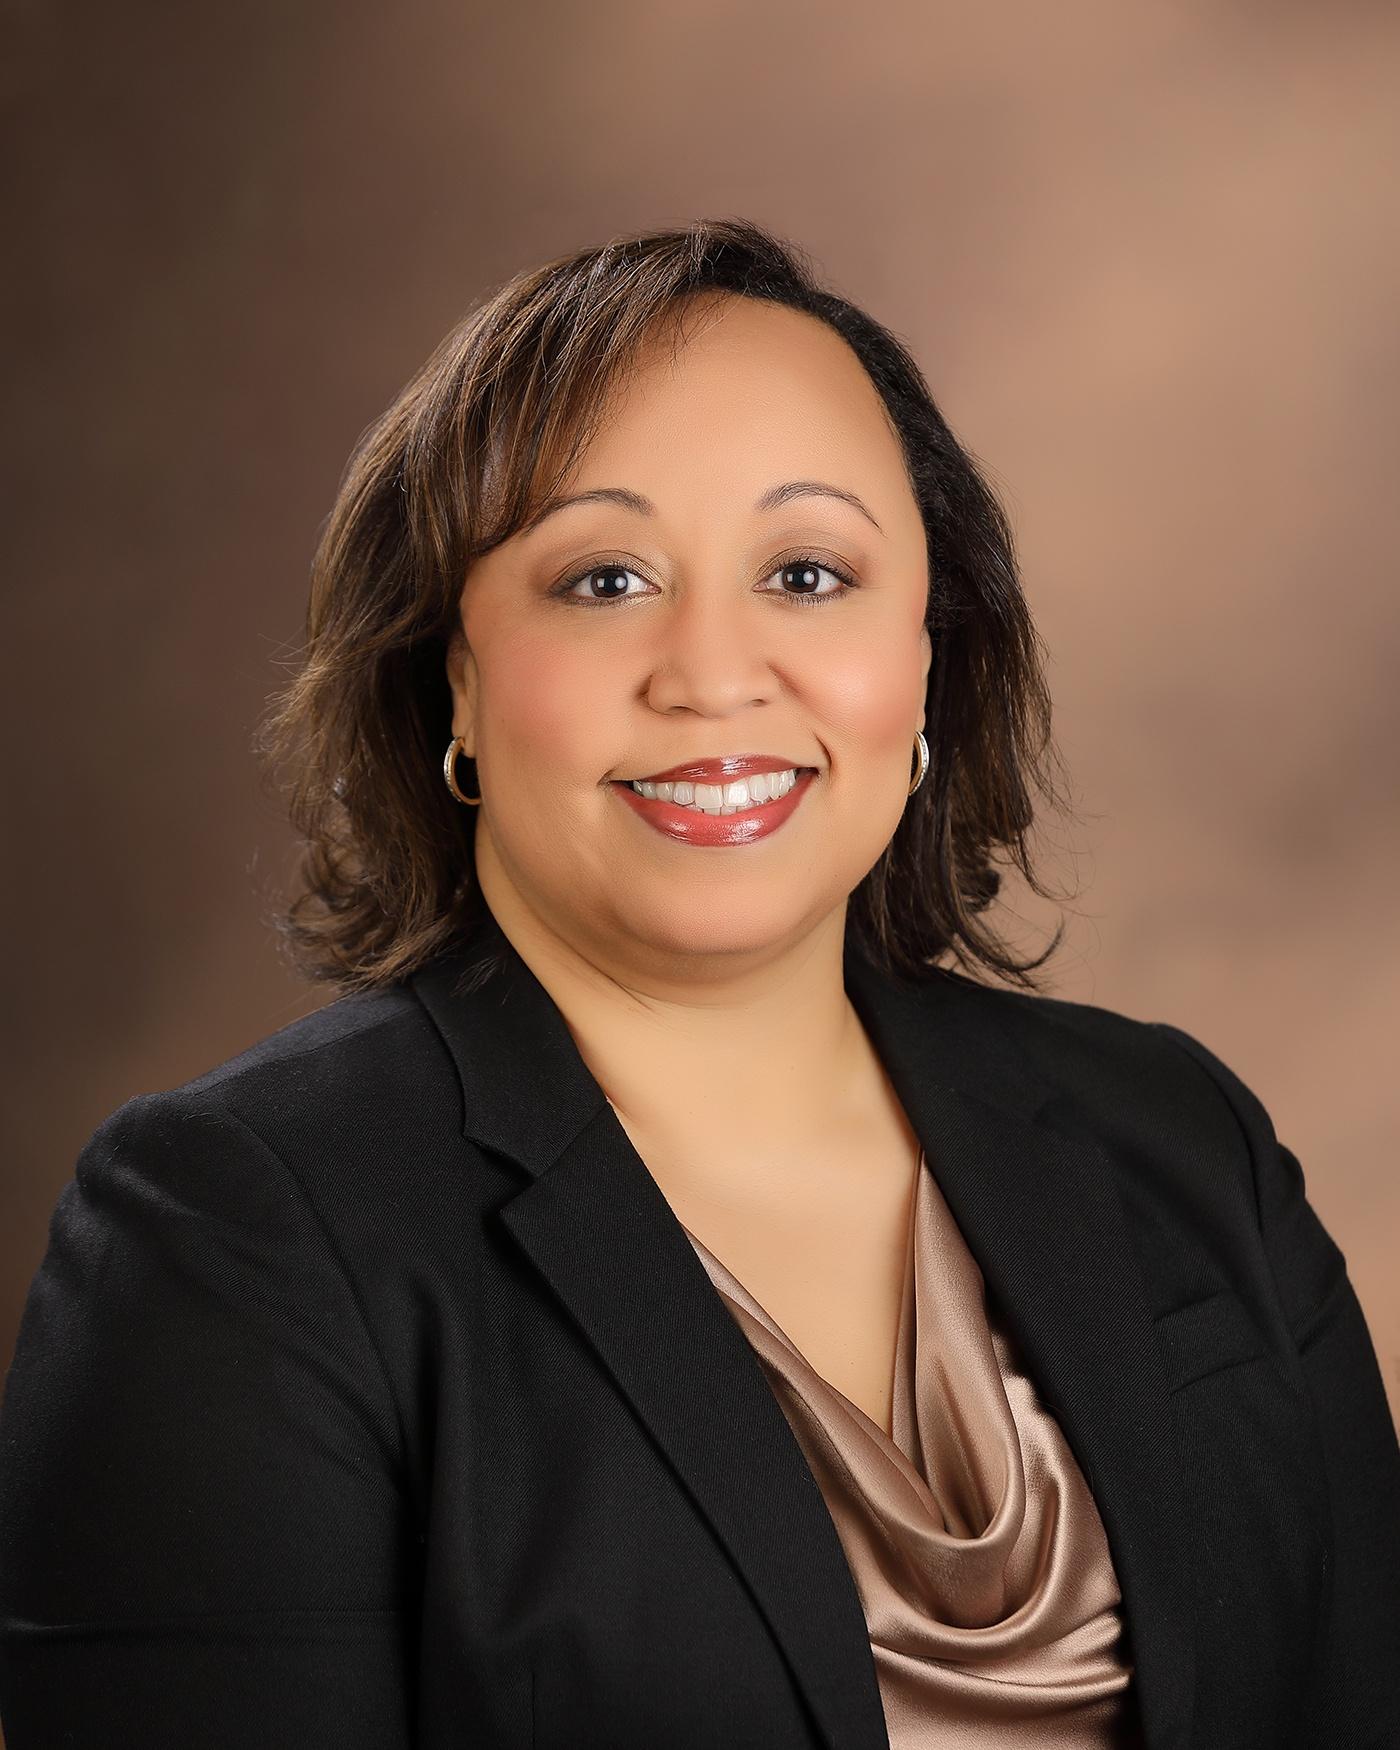 Kathryn Floyd, Health Insurance Consultant and Certified Senior Advisor